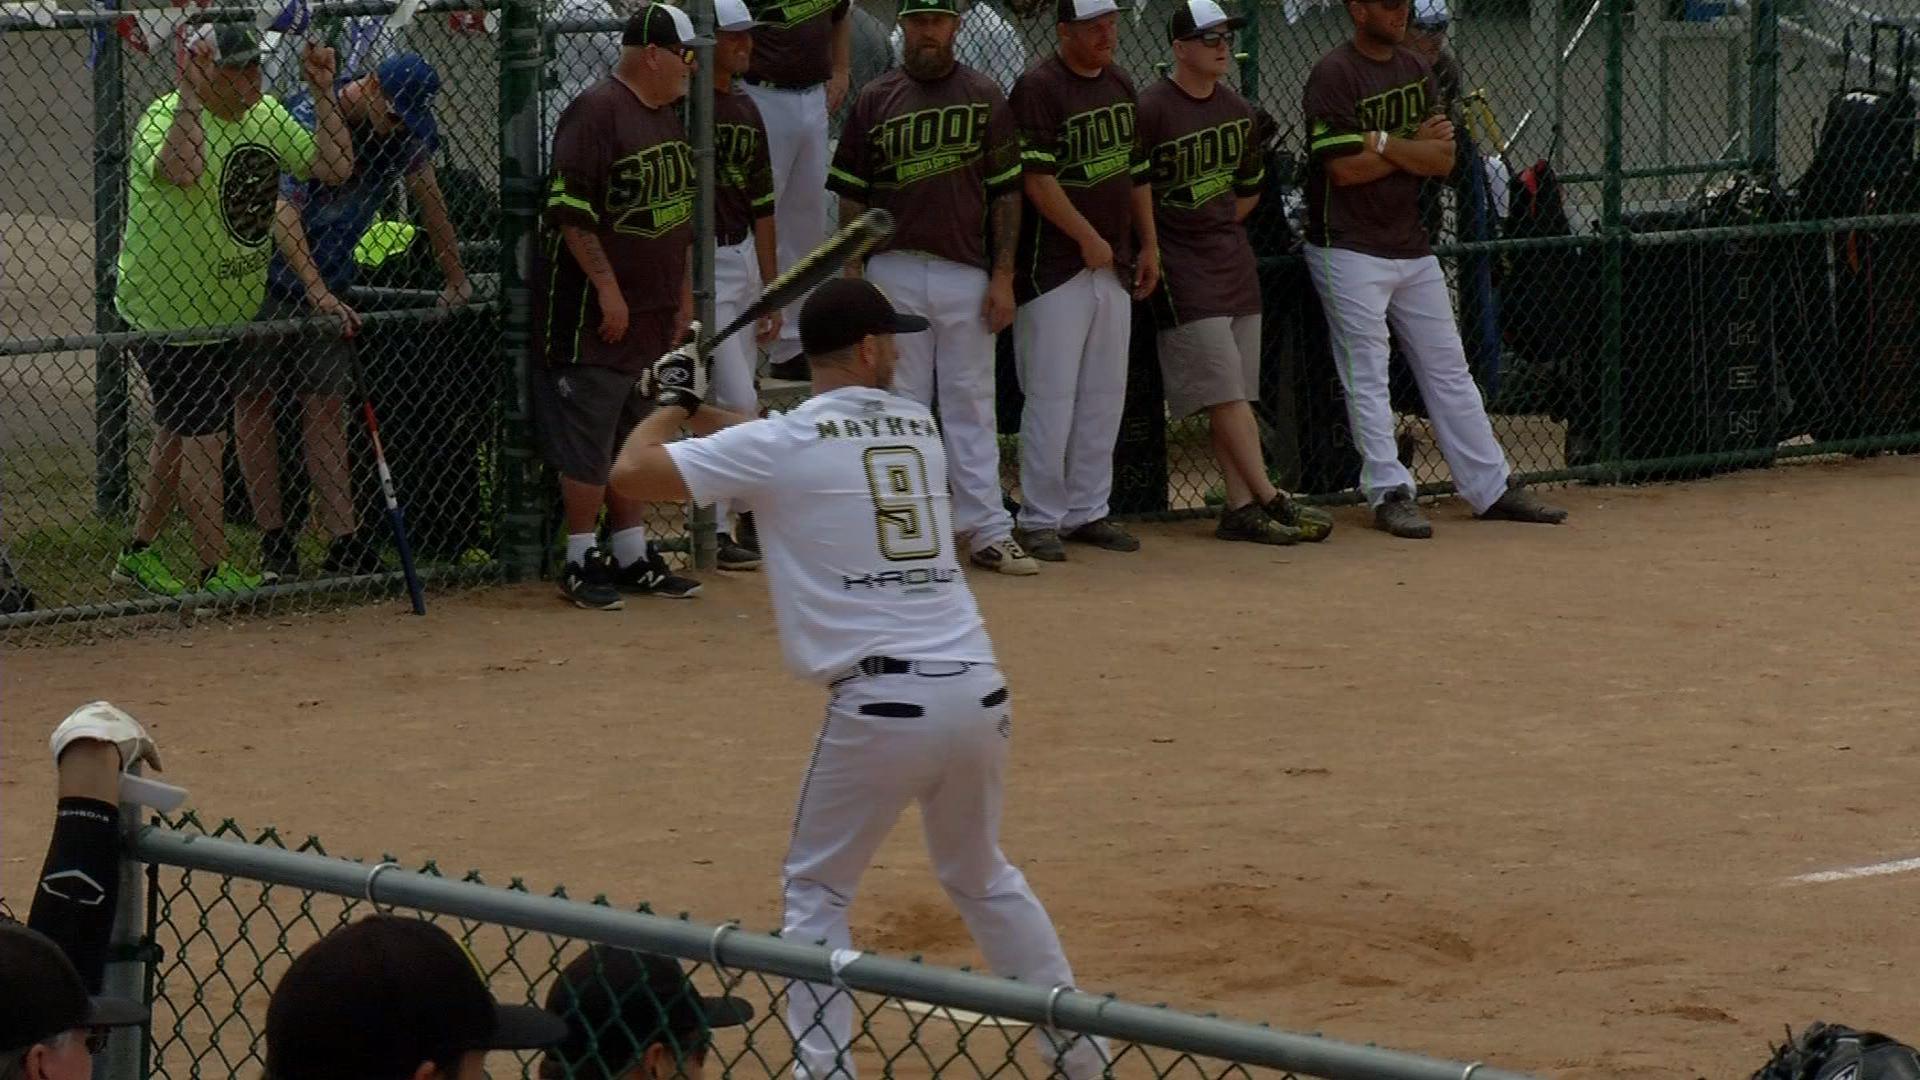 Frolics Softball